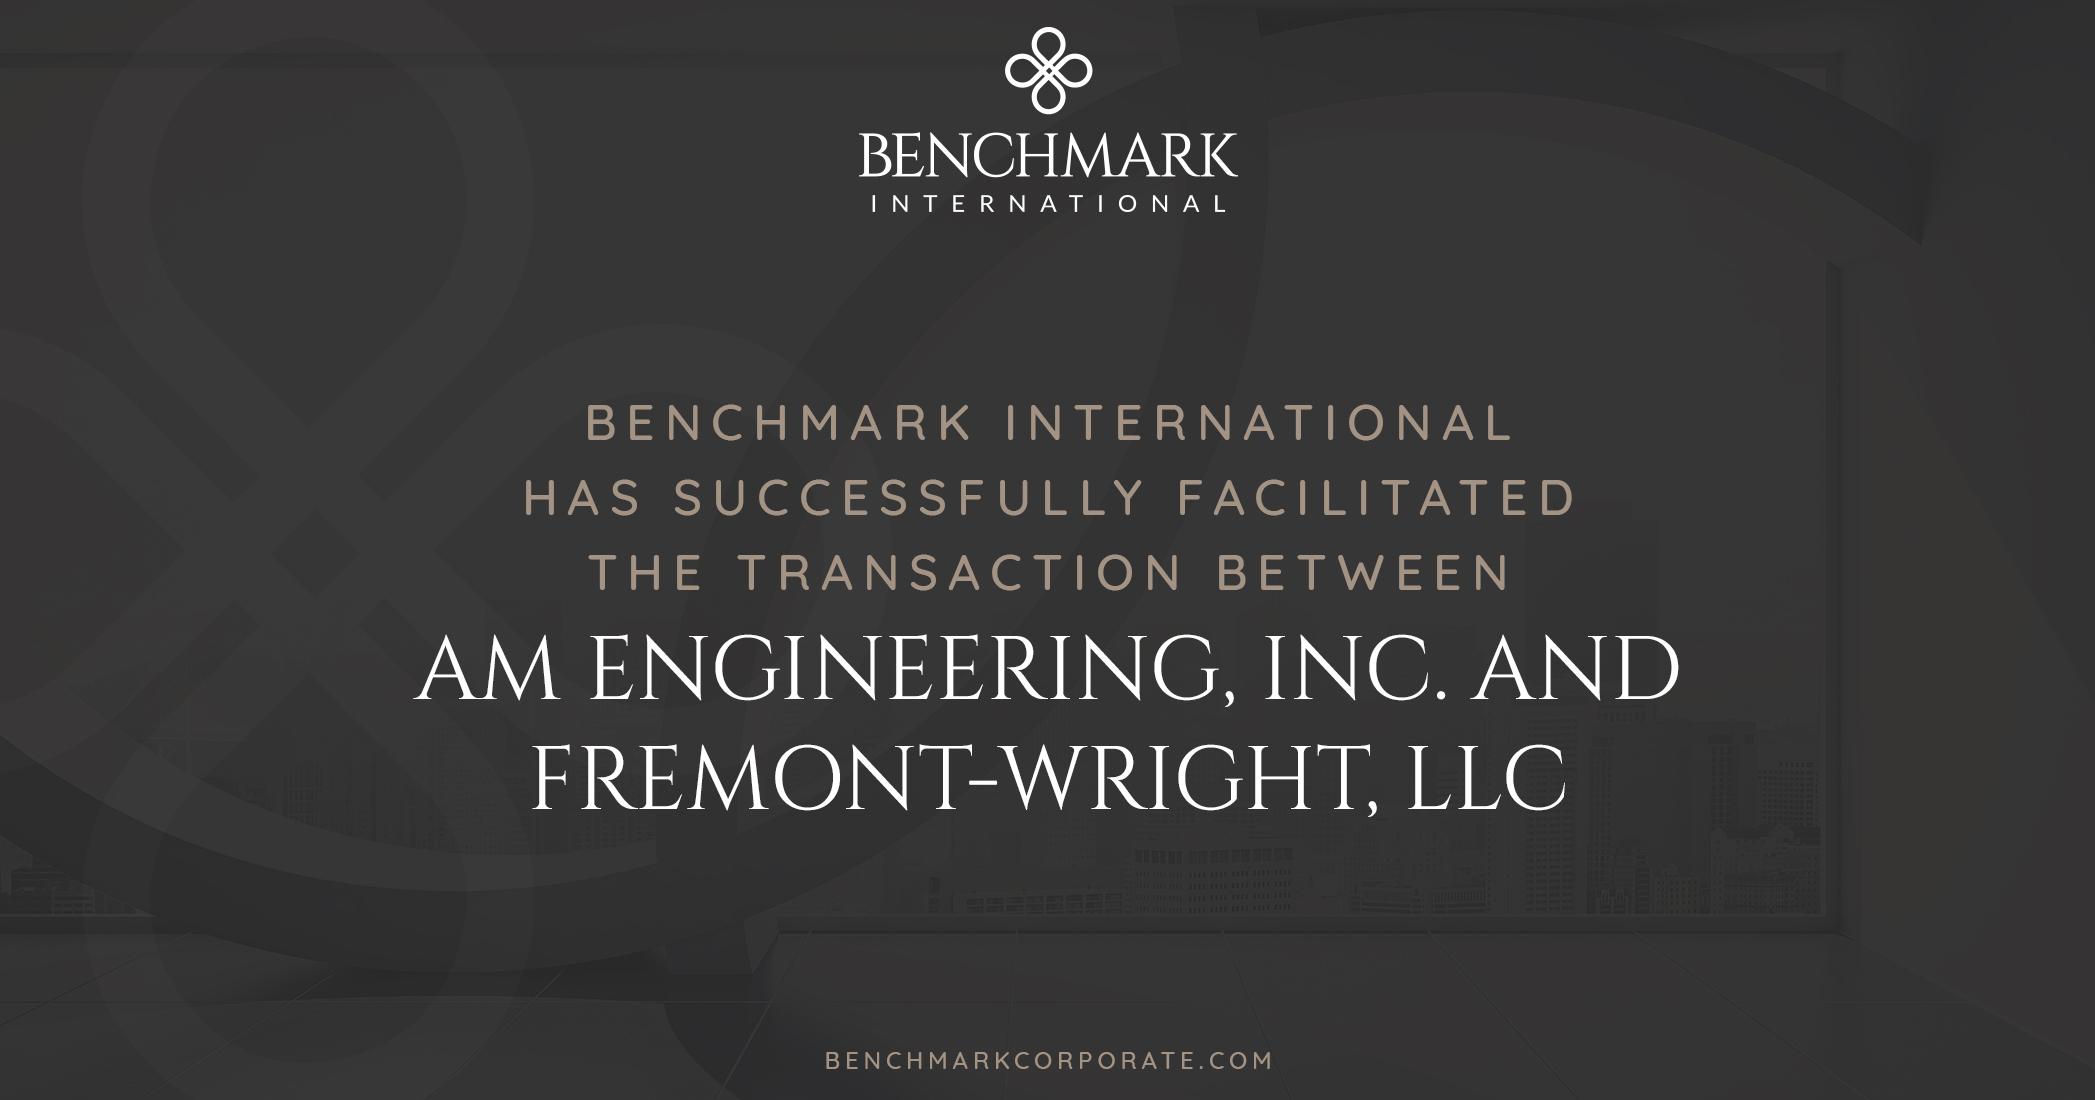 Benchmark International Facilitated The Transaction Of Am Engineering, Inc. To Fremont-Wright, LLC